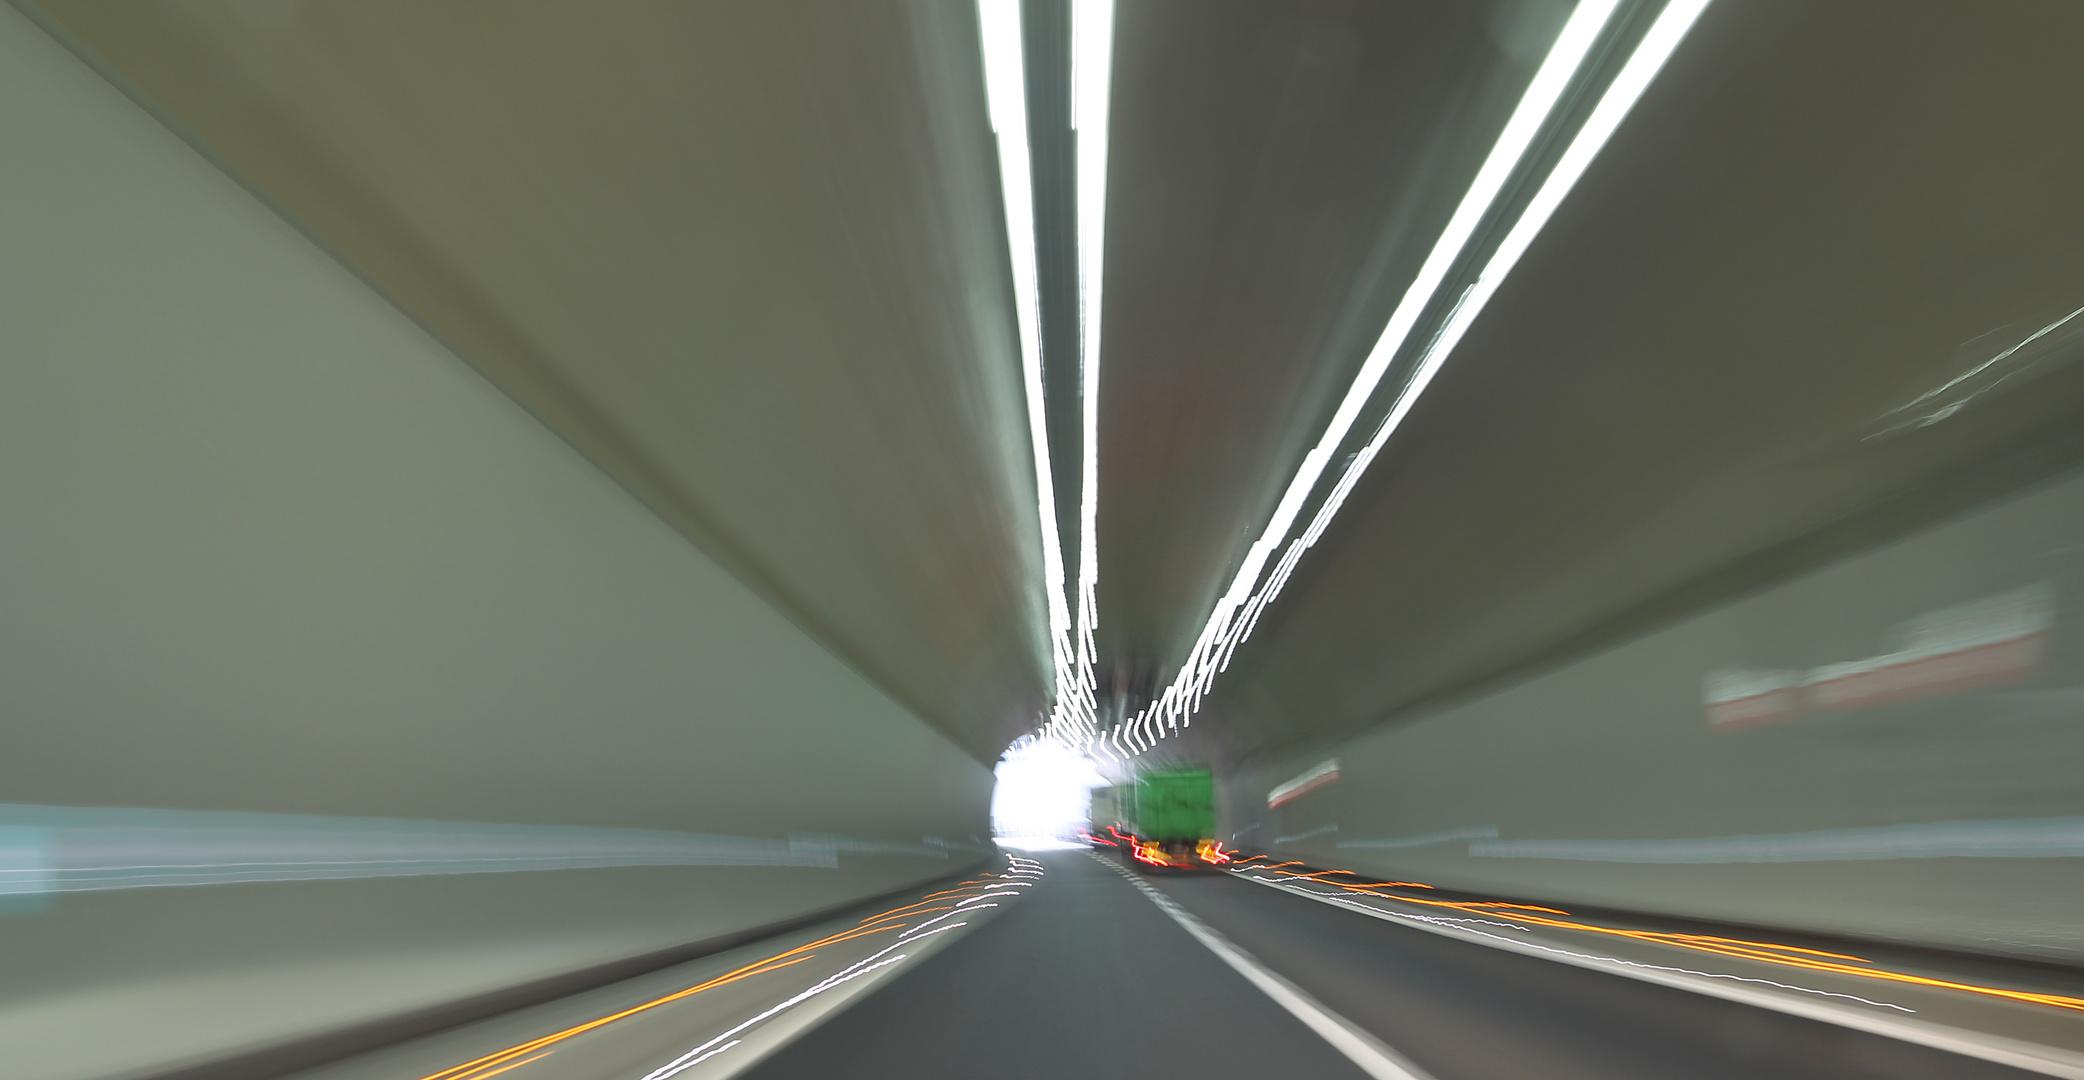 Tunnelwusch .. *